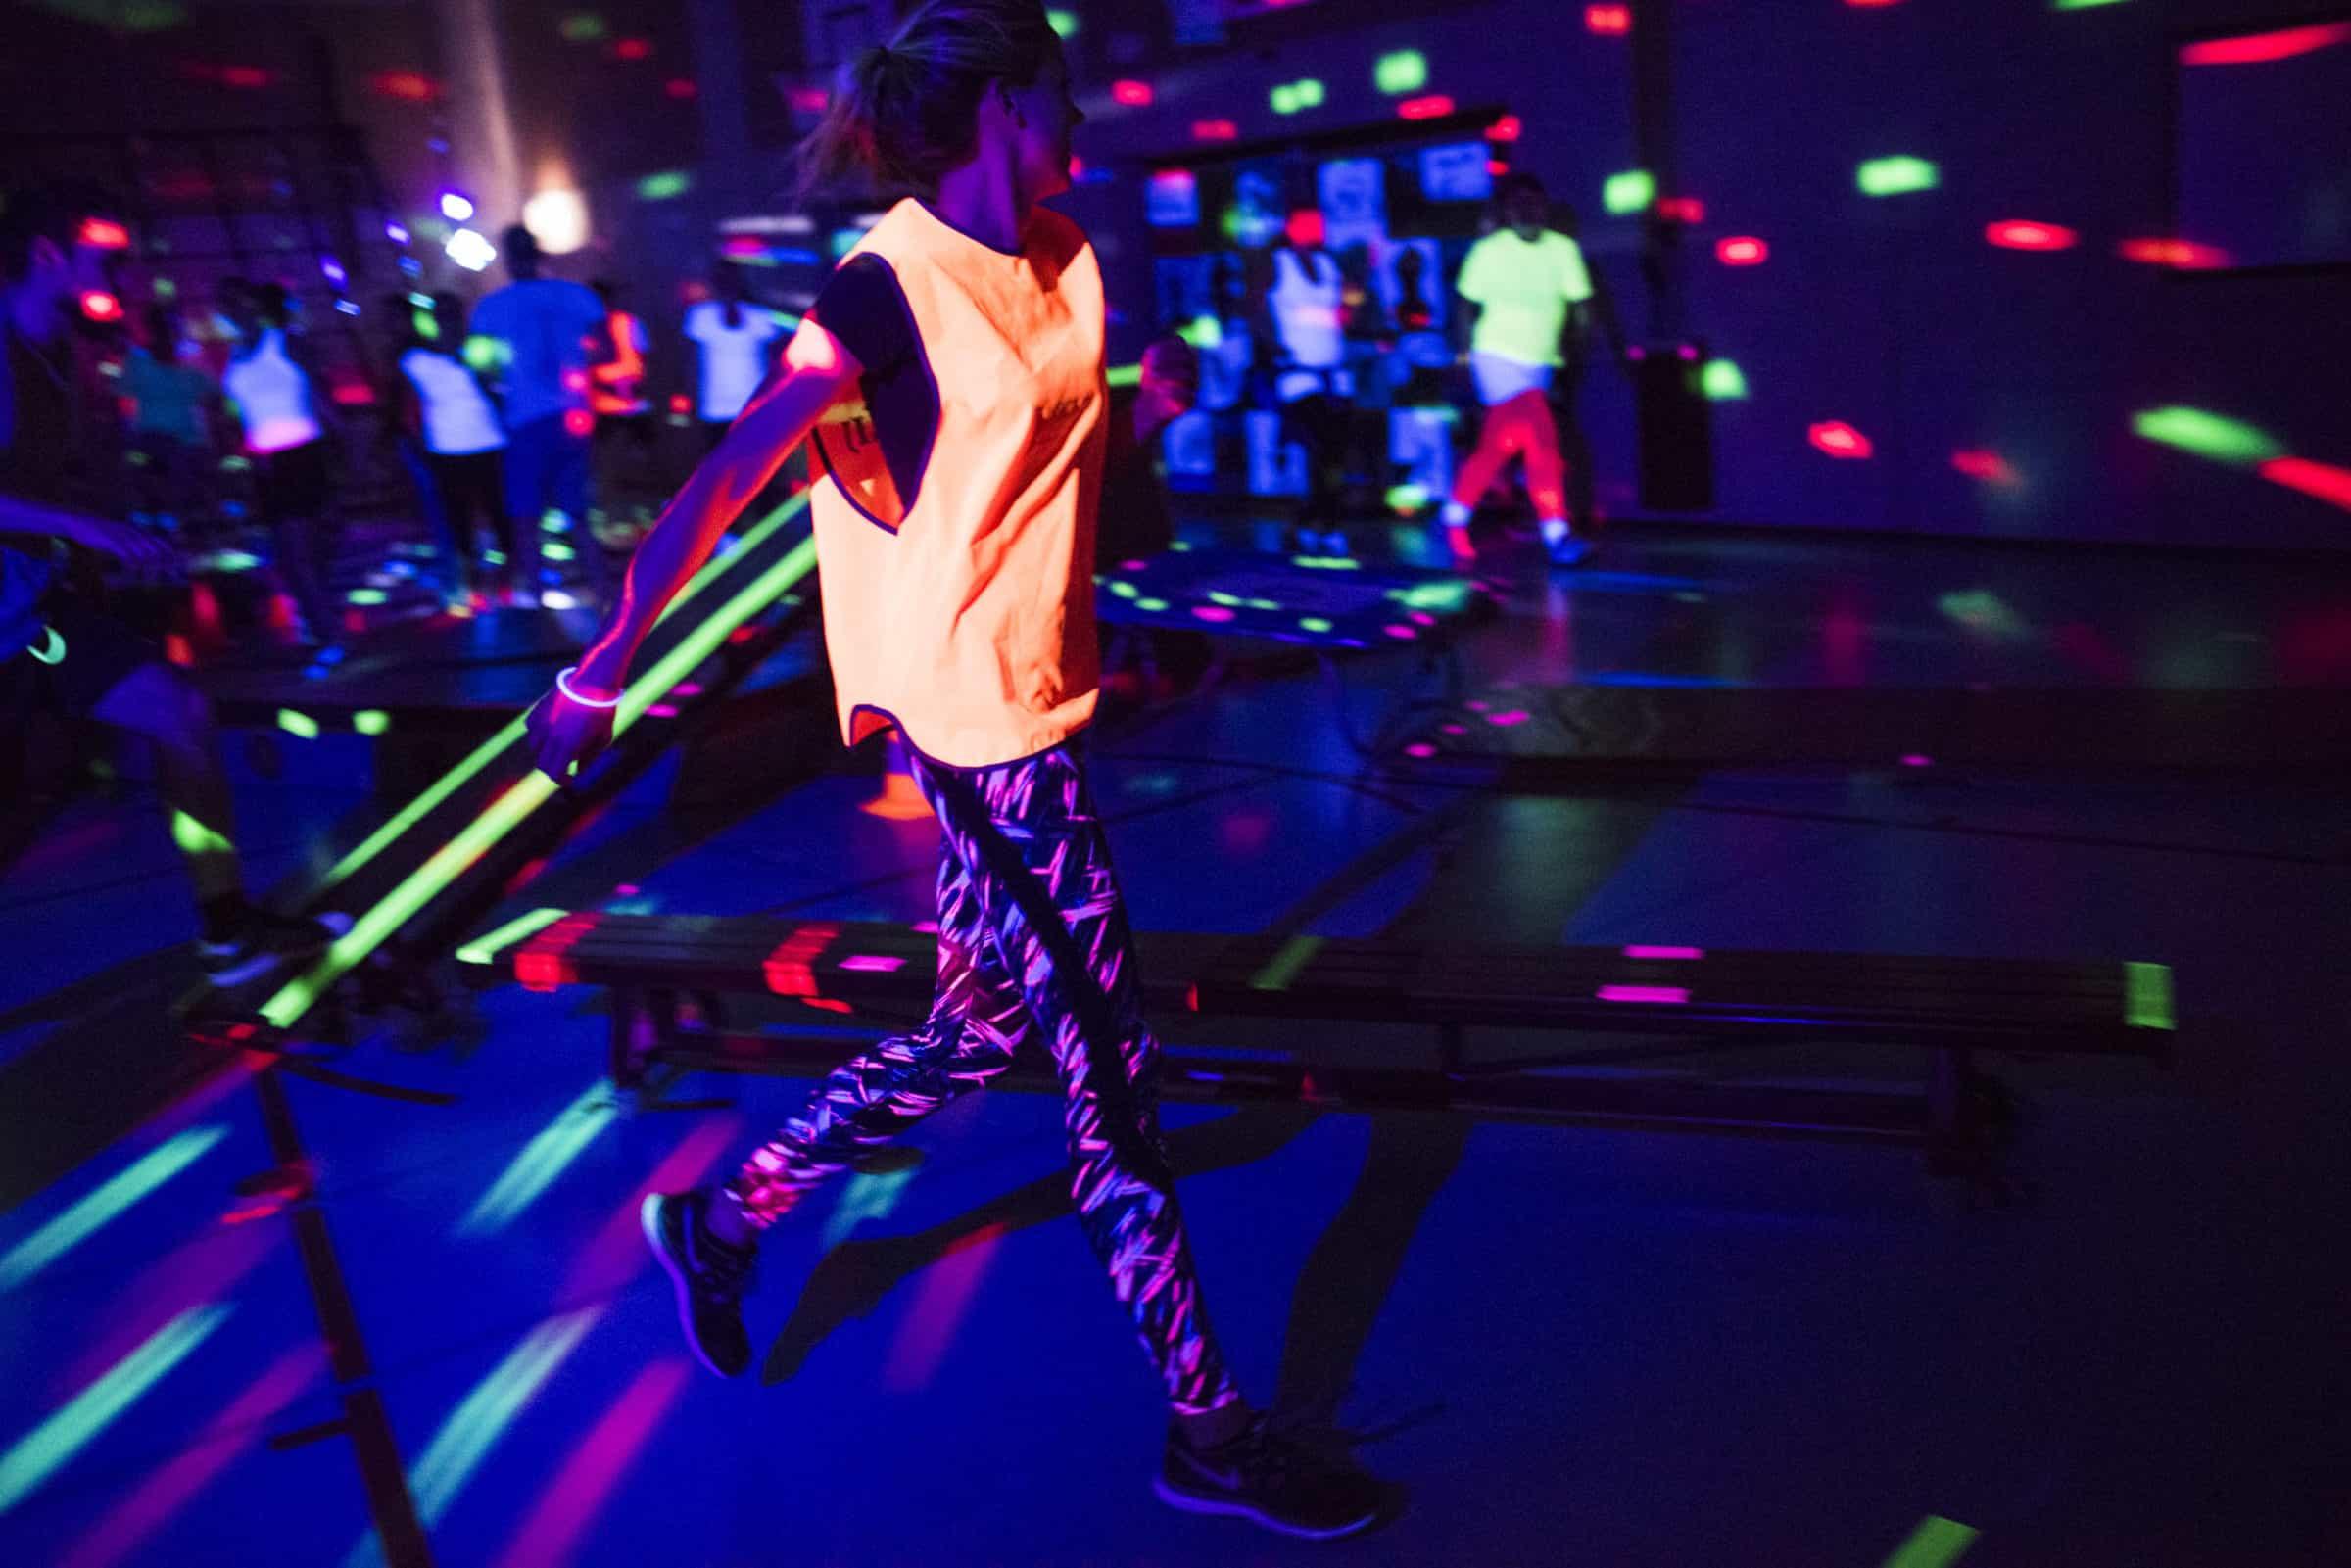 HEADER APENKOOI_4 - sportief, gym, kind, spelletjes, blacklight